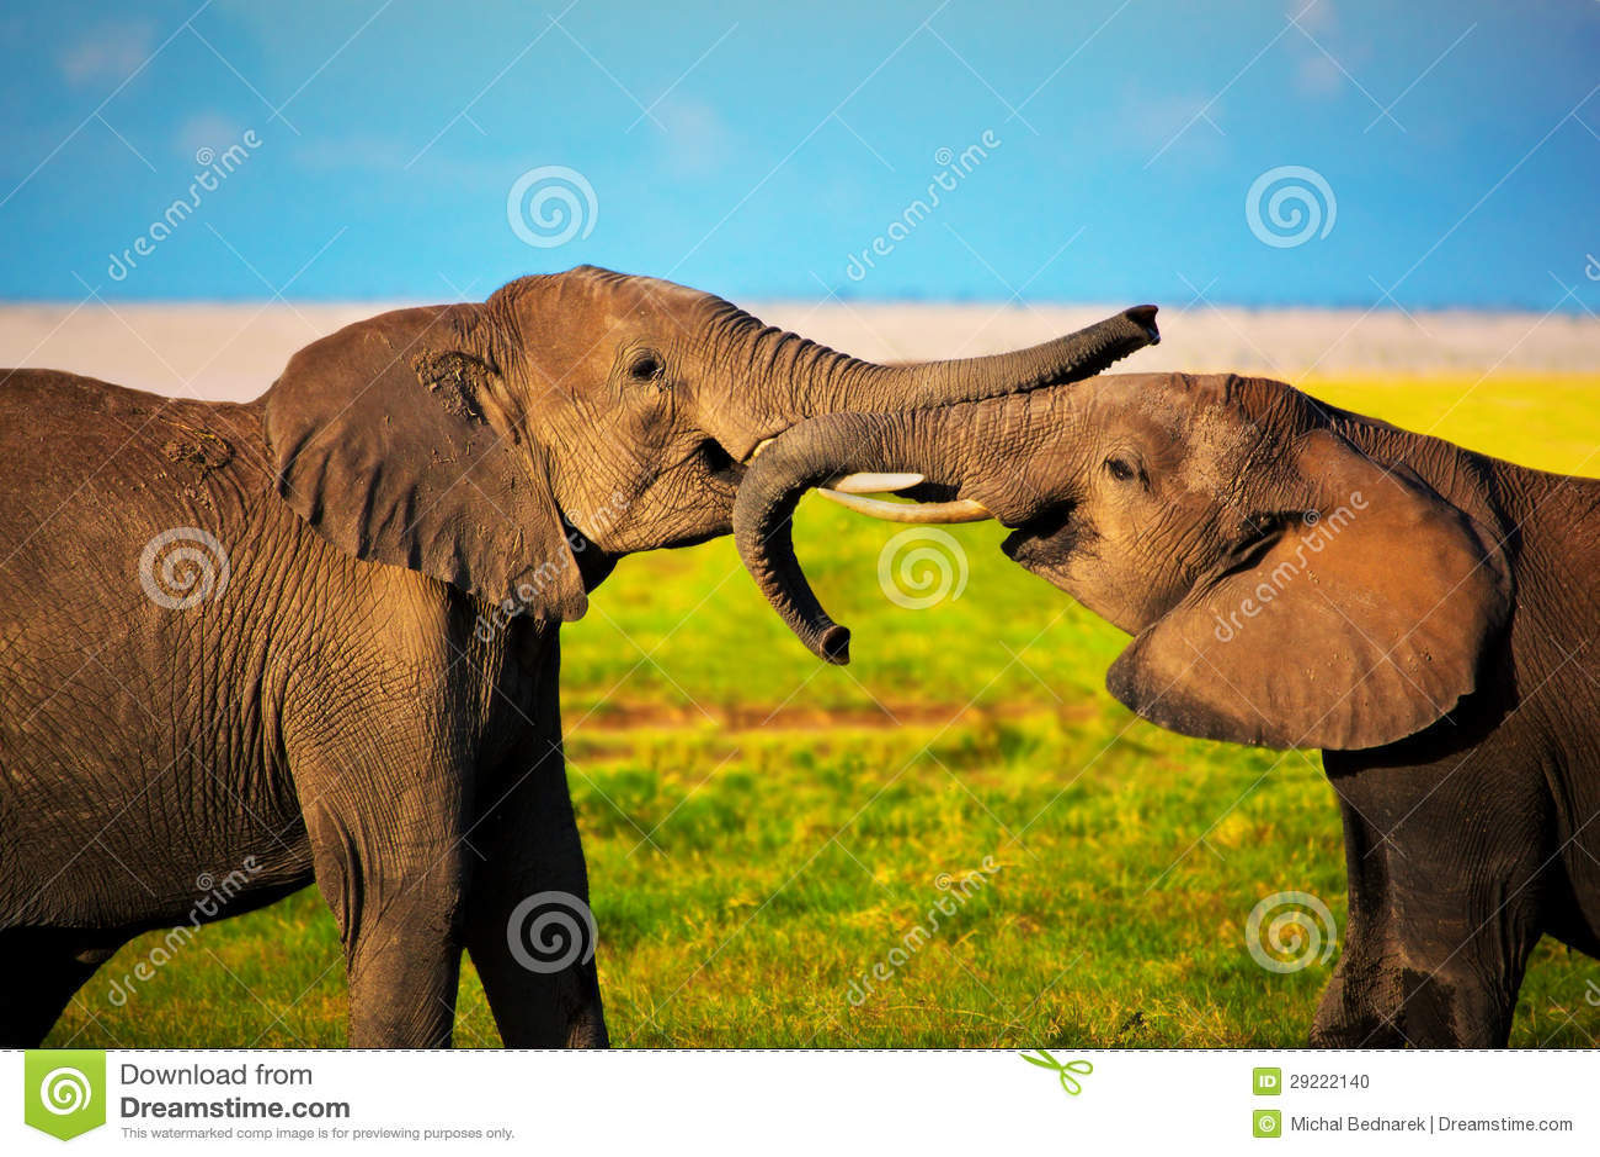 Elefantes que juegan en sabana. Safari en Amboseli, Kenia, África